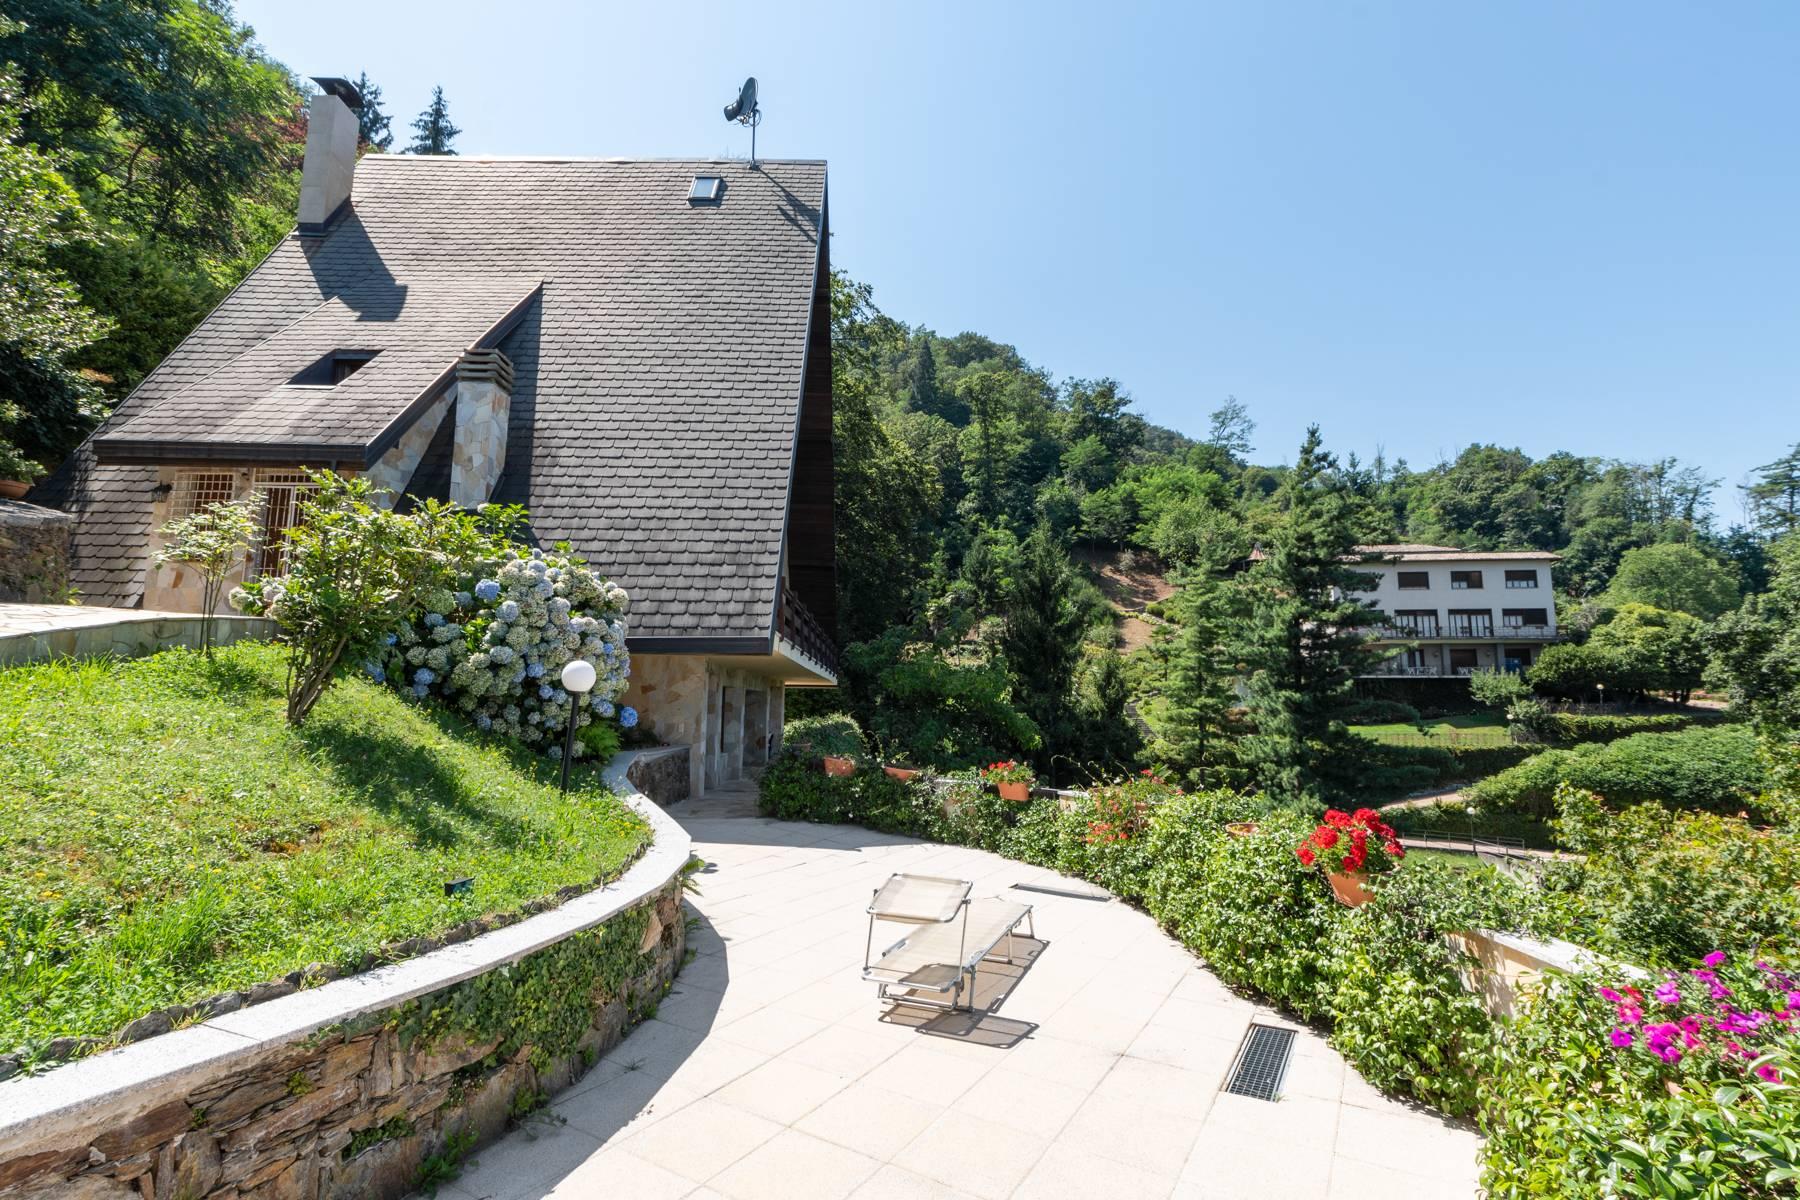 Villa in Vendita a Stresa: 5 locali, 364 mq - Foto 9